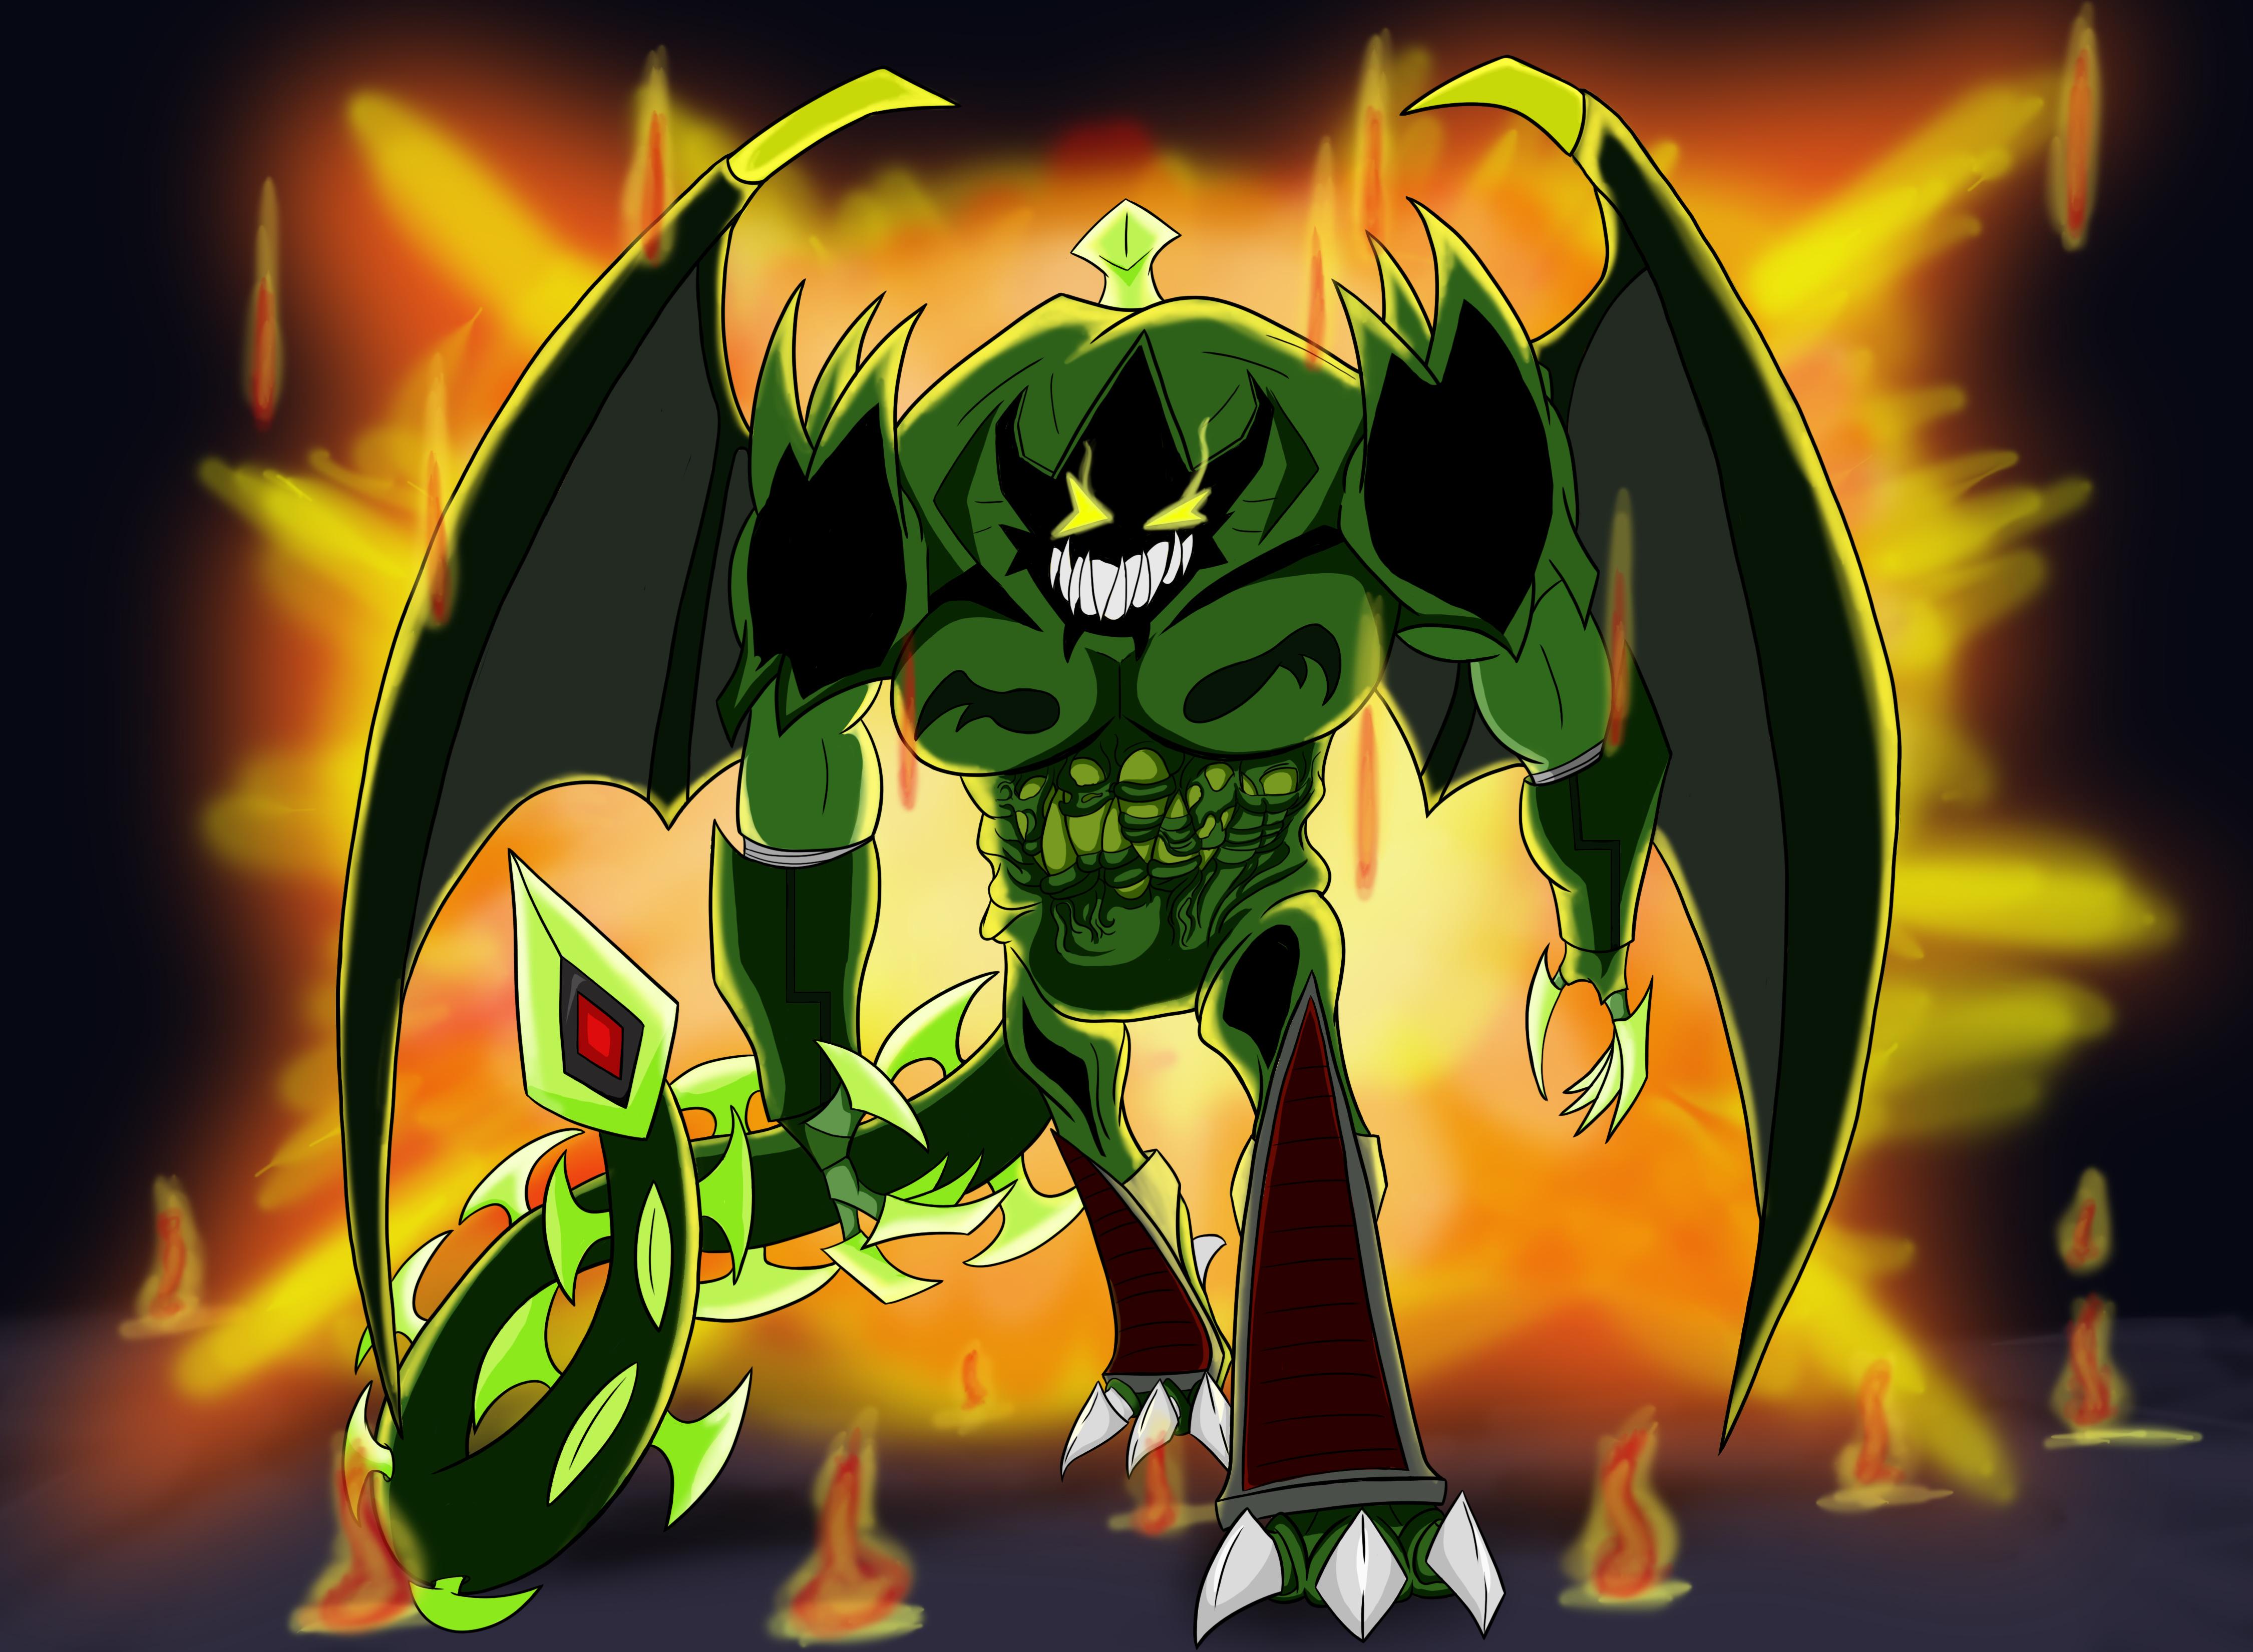 Demon's wrath